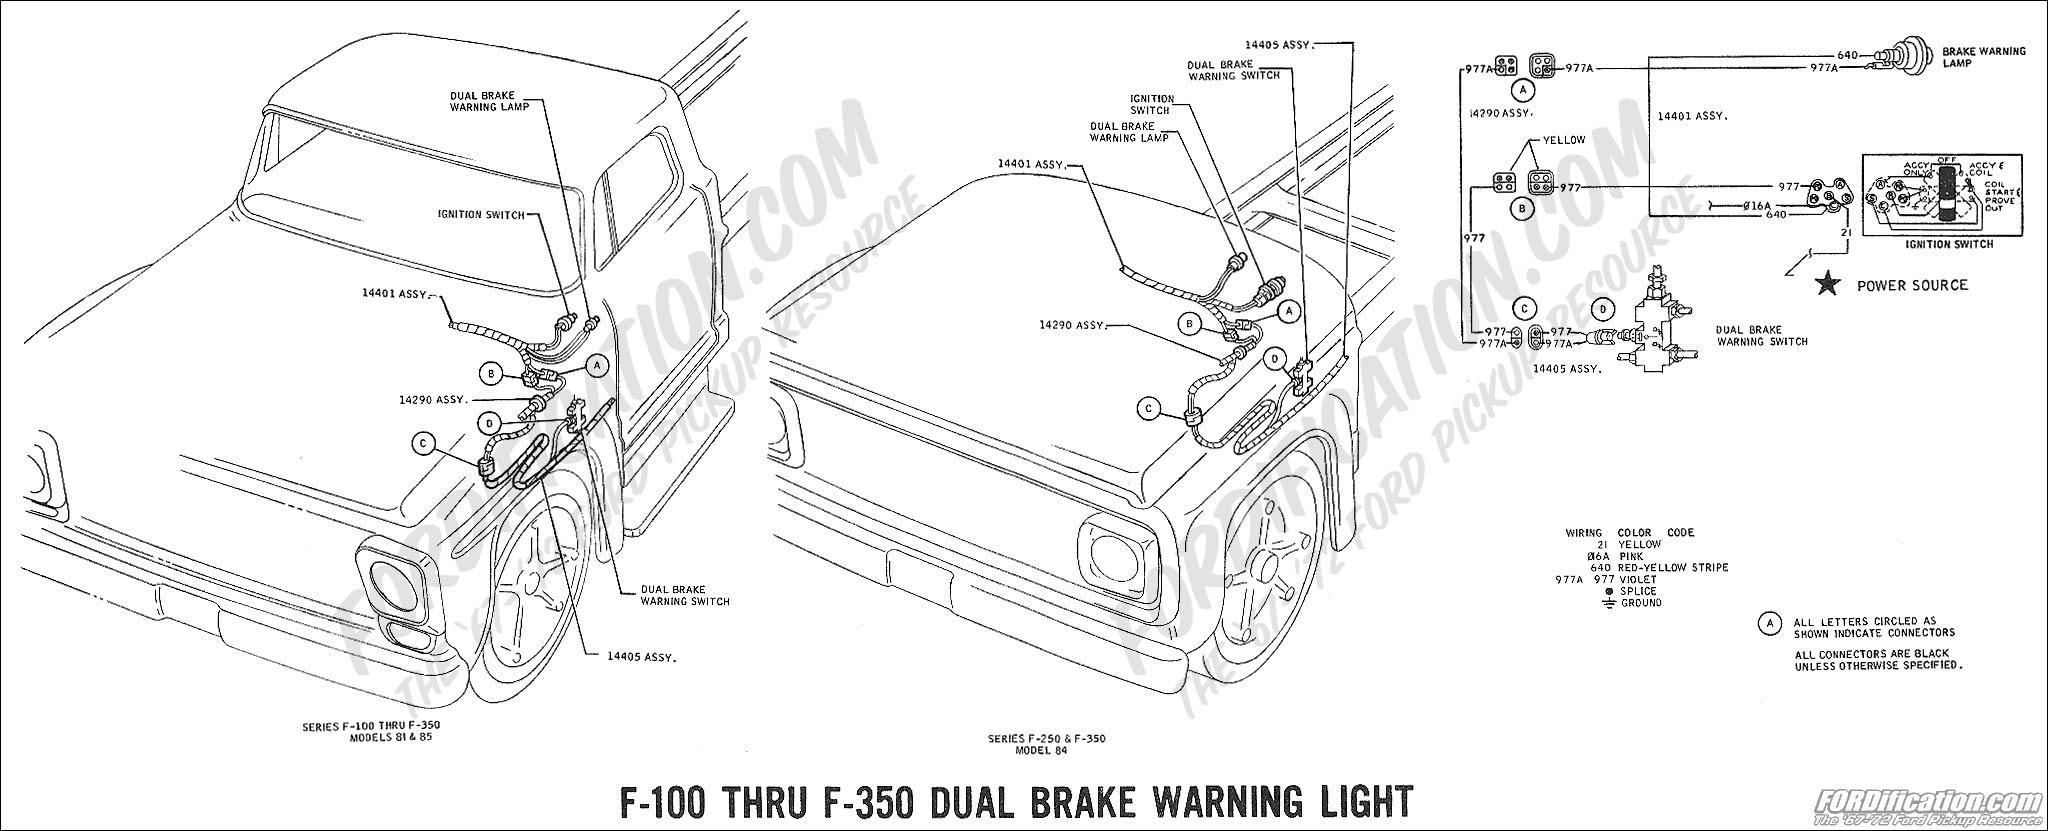 1987 jeep wrangler fuse box diagram wiring schematic